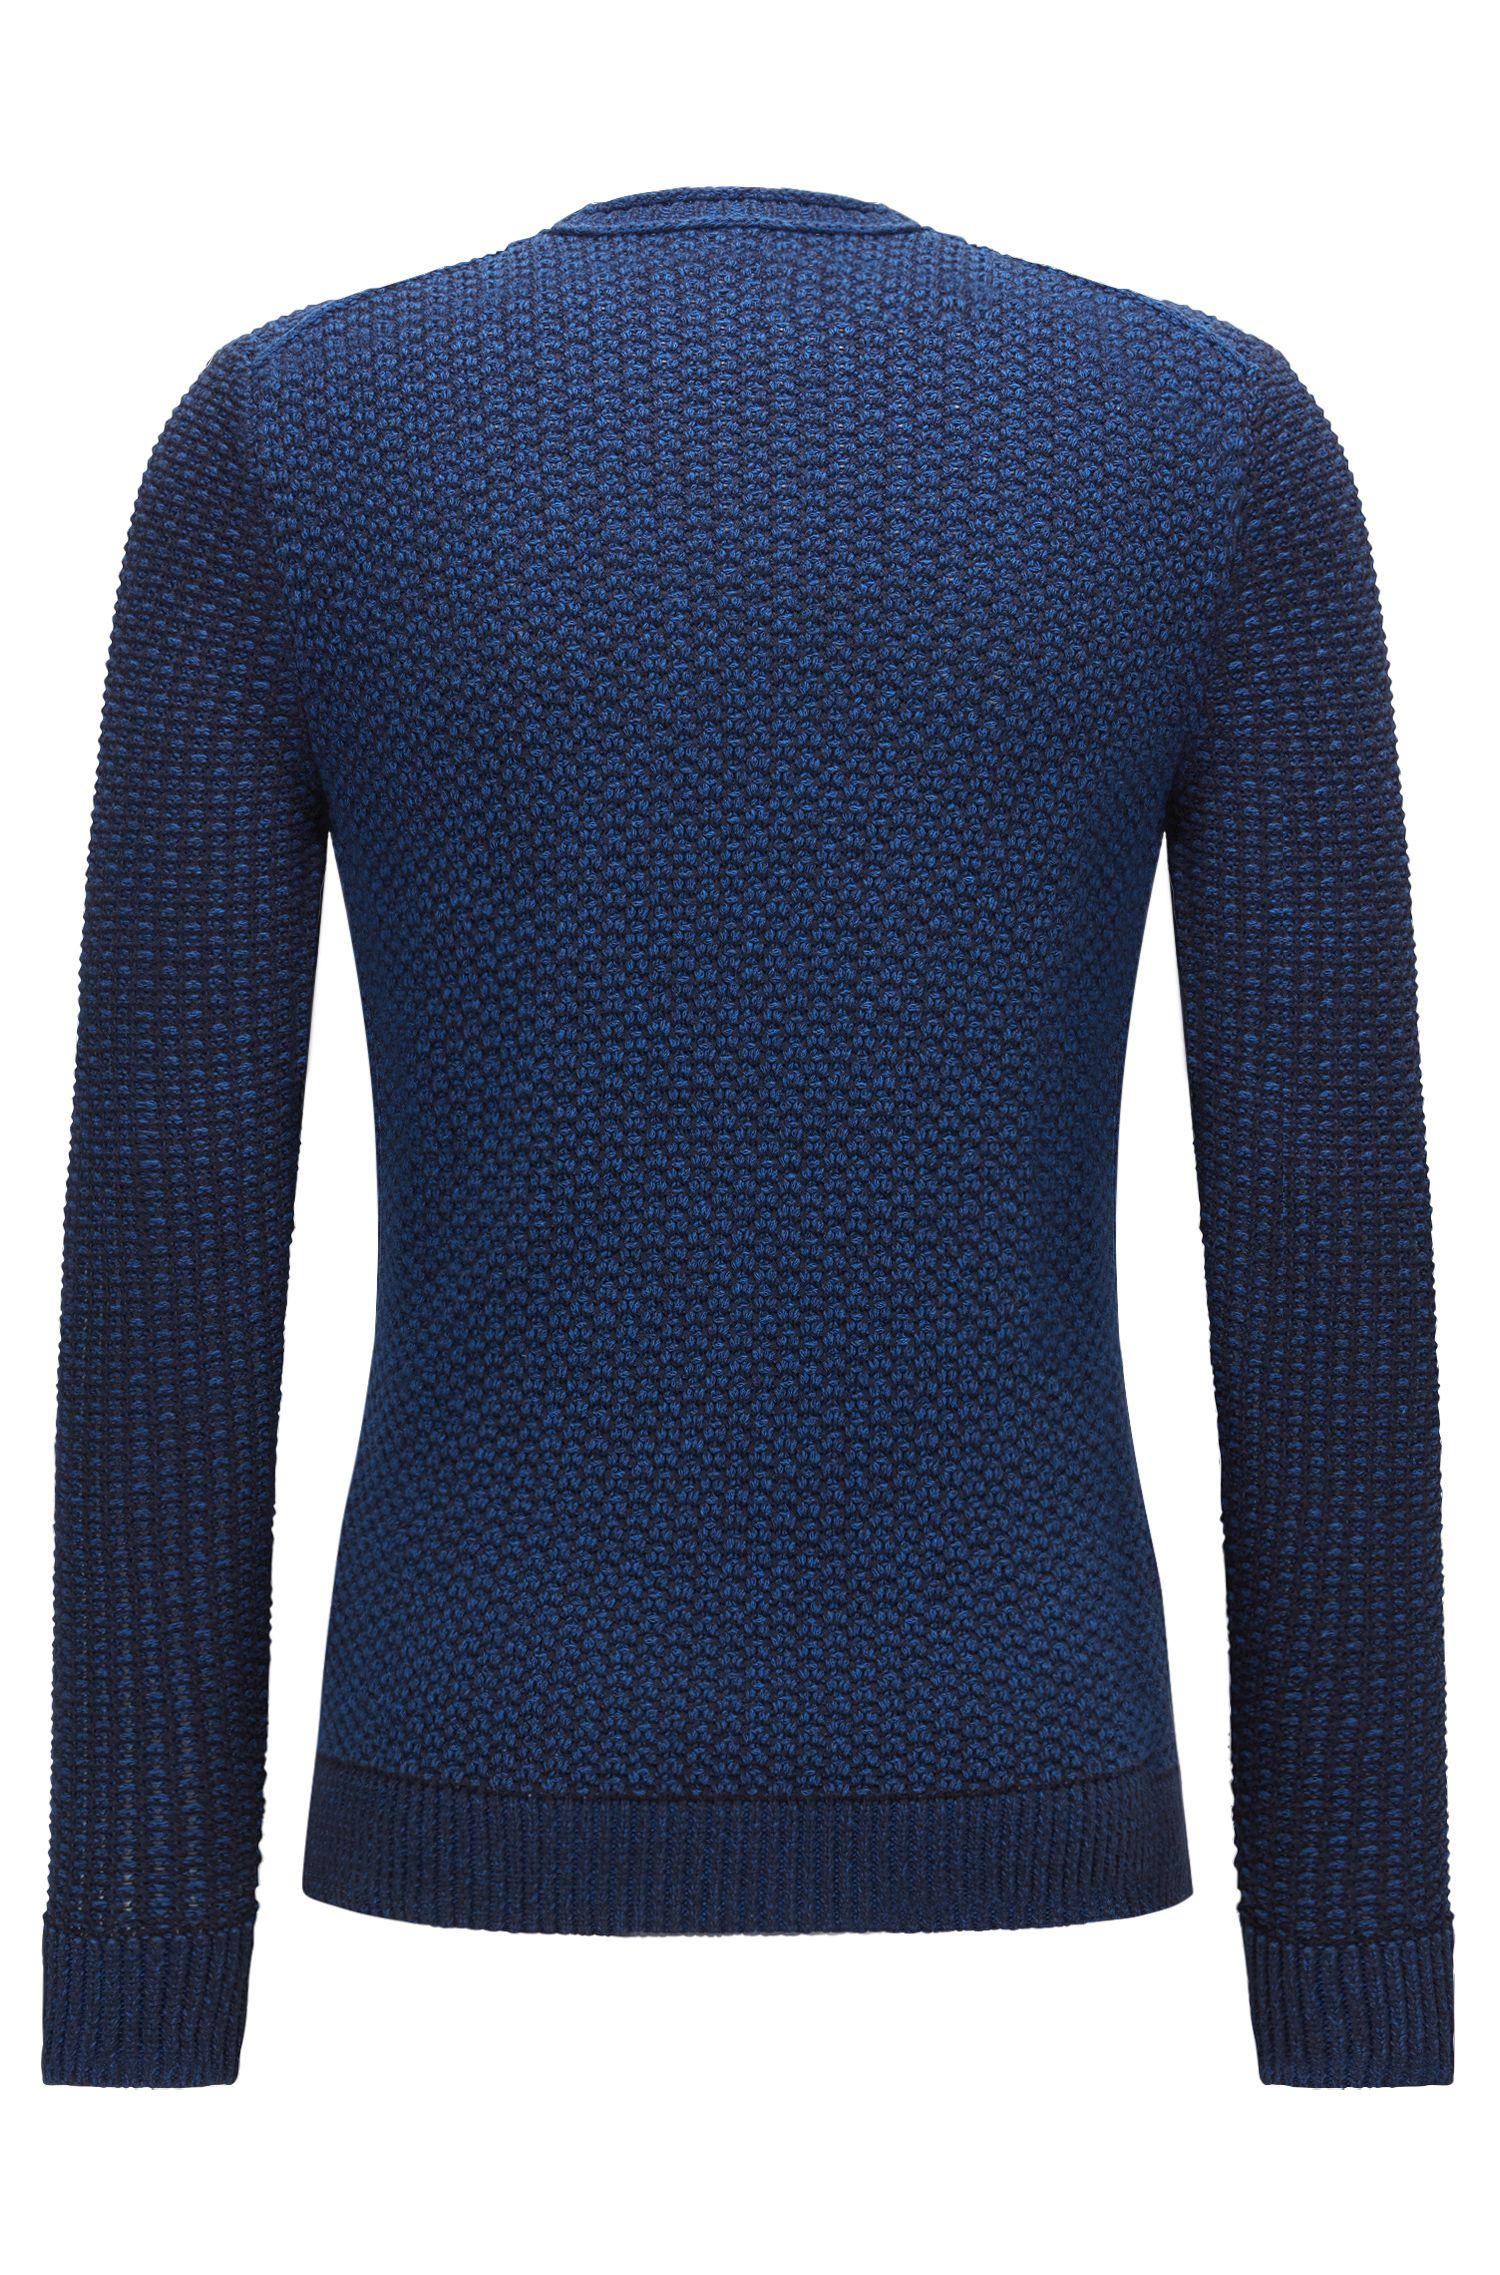 Dobby Cotton Sweater   Kindpaul